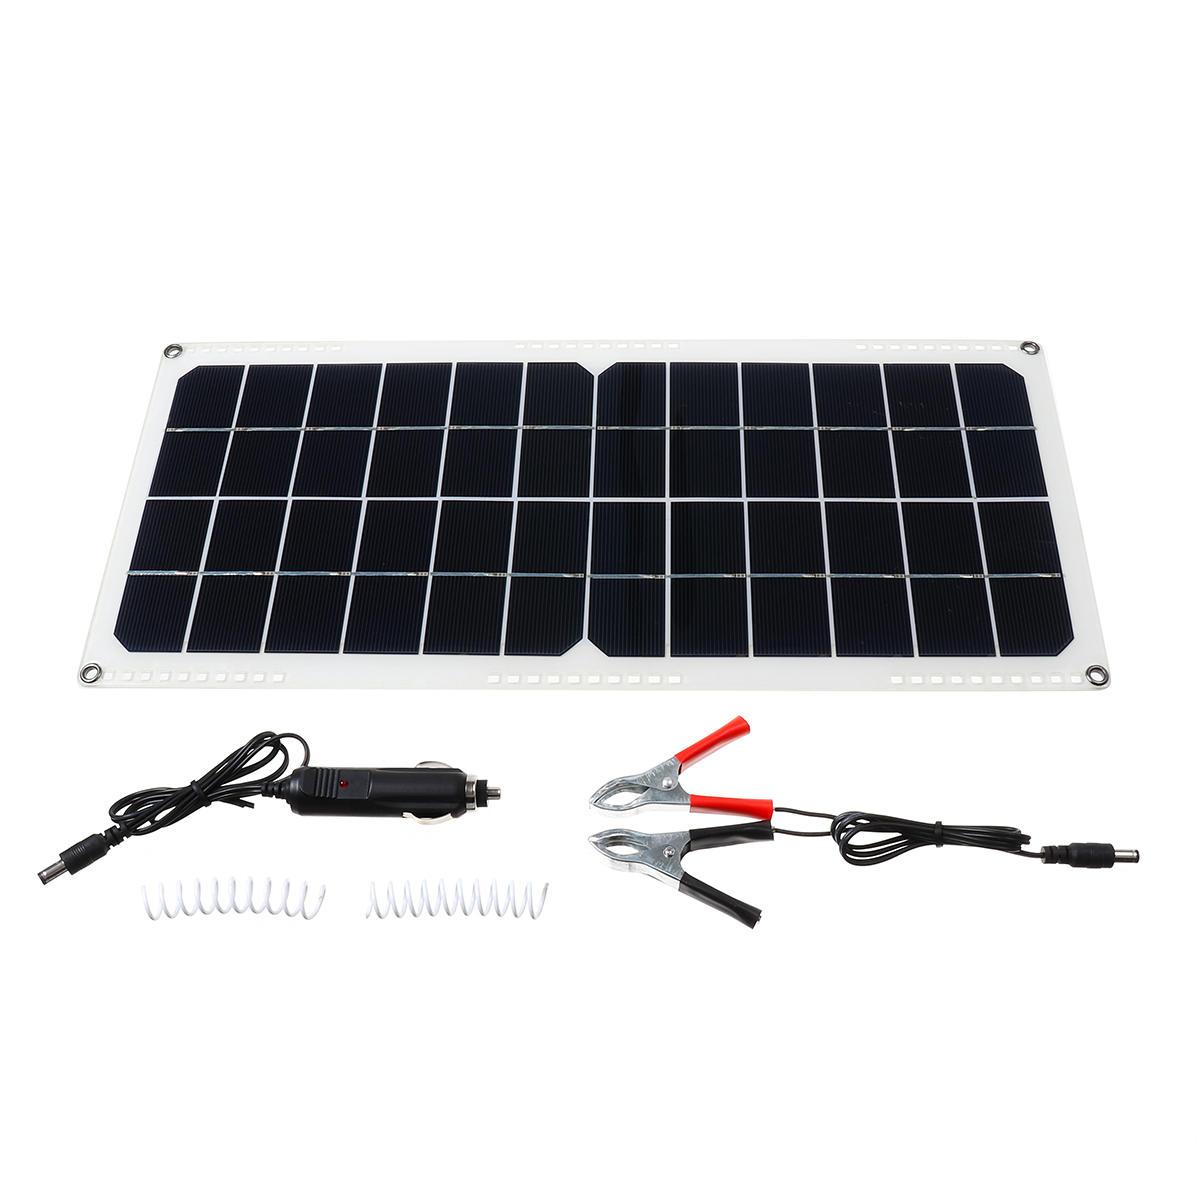 10W Monocrystalline Solar Panel DIY Solar Powered Panel With 2 Connectors(